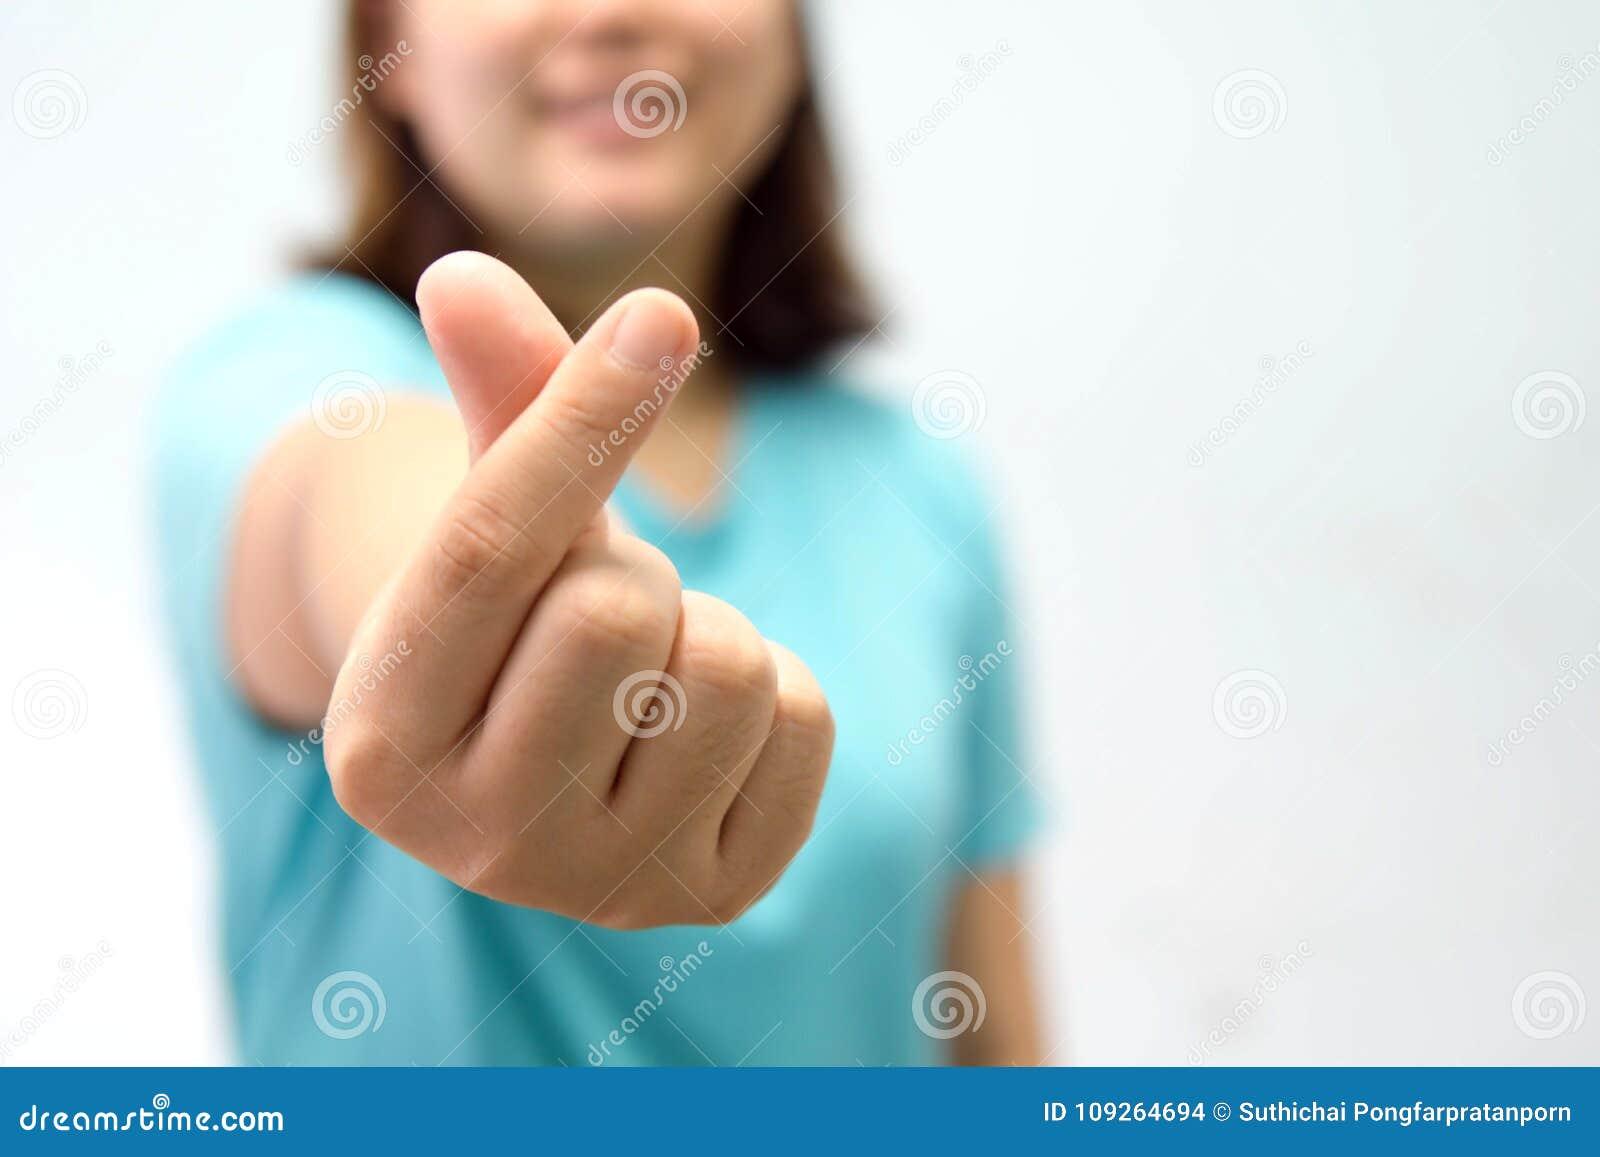 A woman do finger sign, call